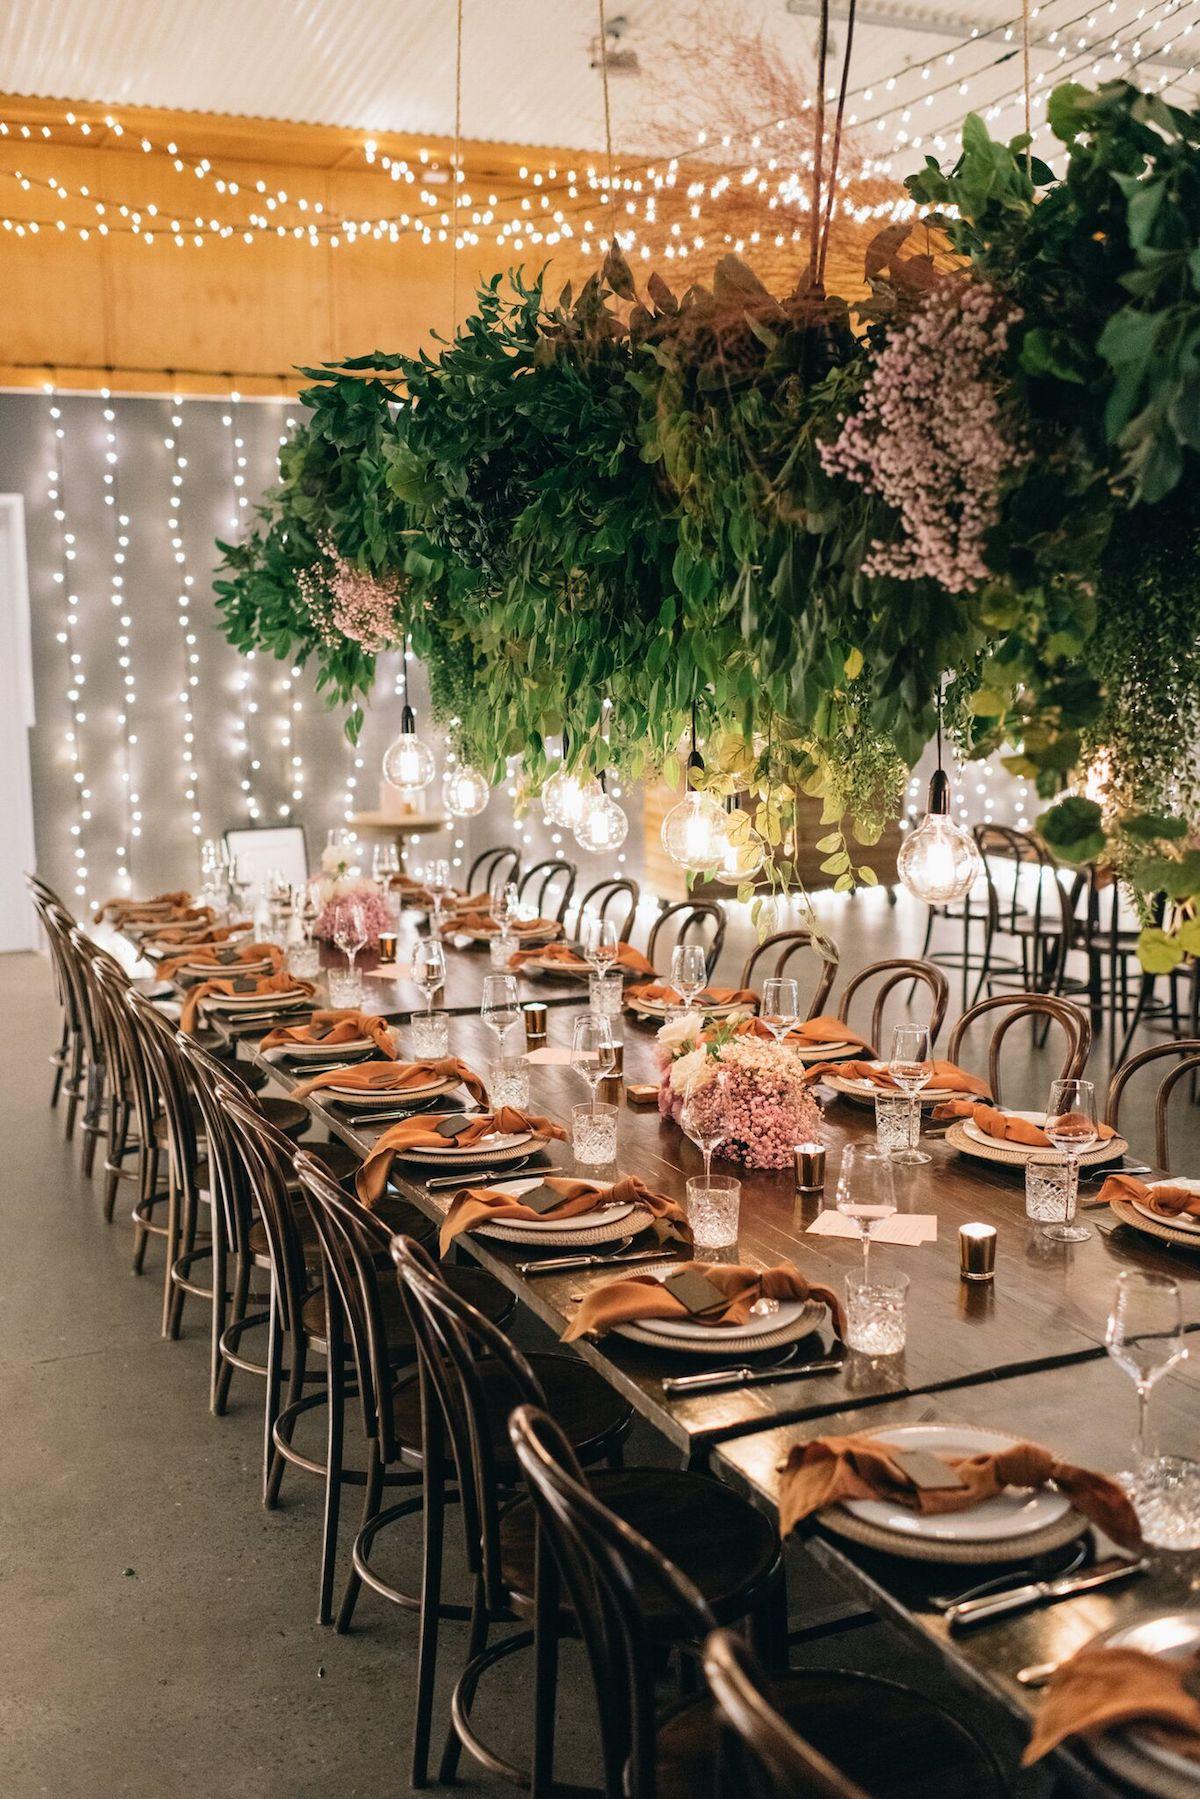 Linen Napkin Hire Wedding Styling Inspiration11.jpeg